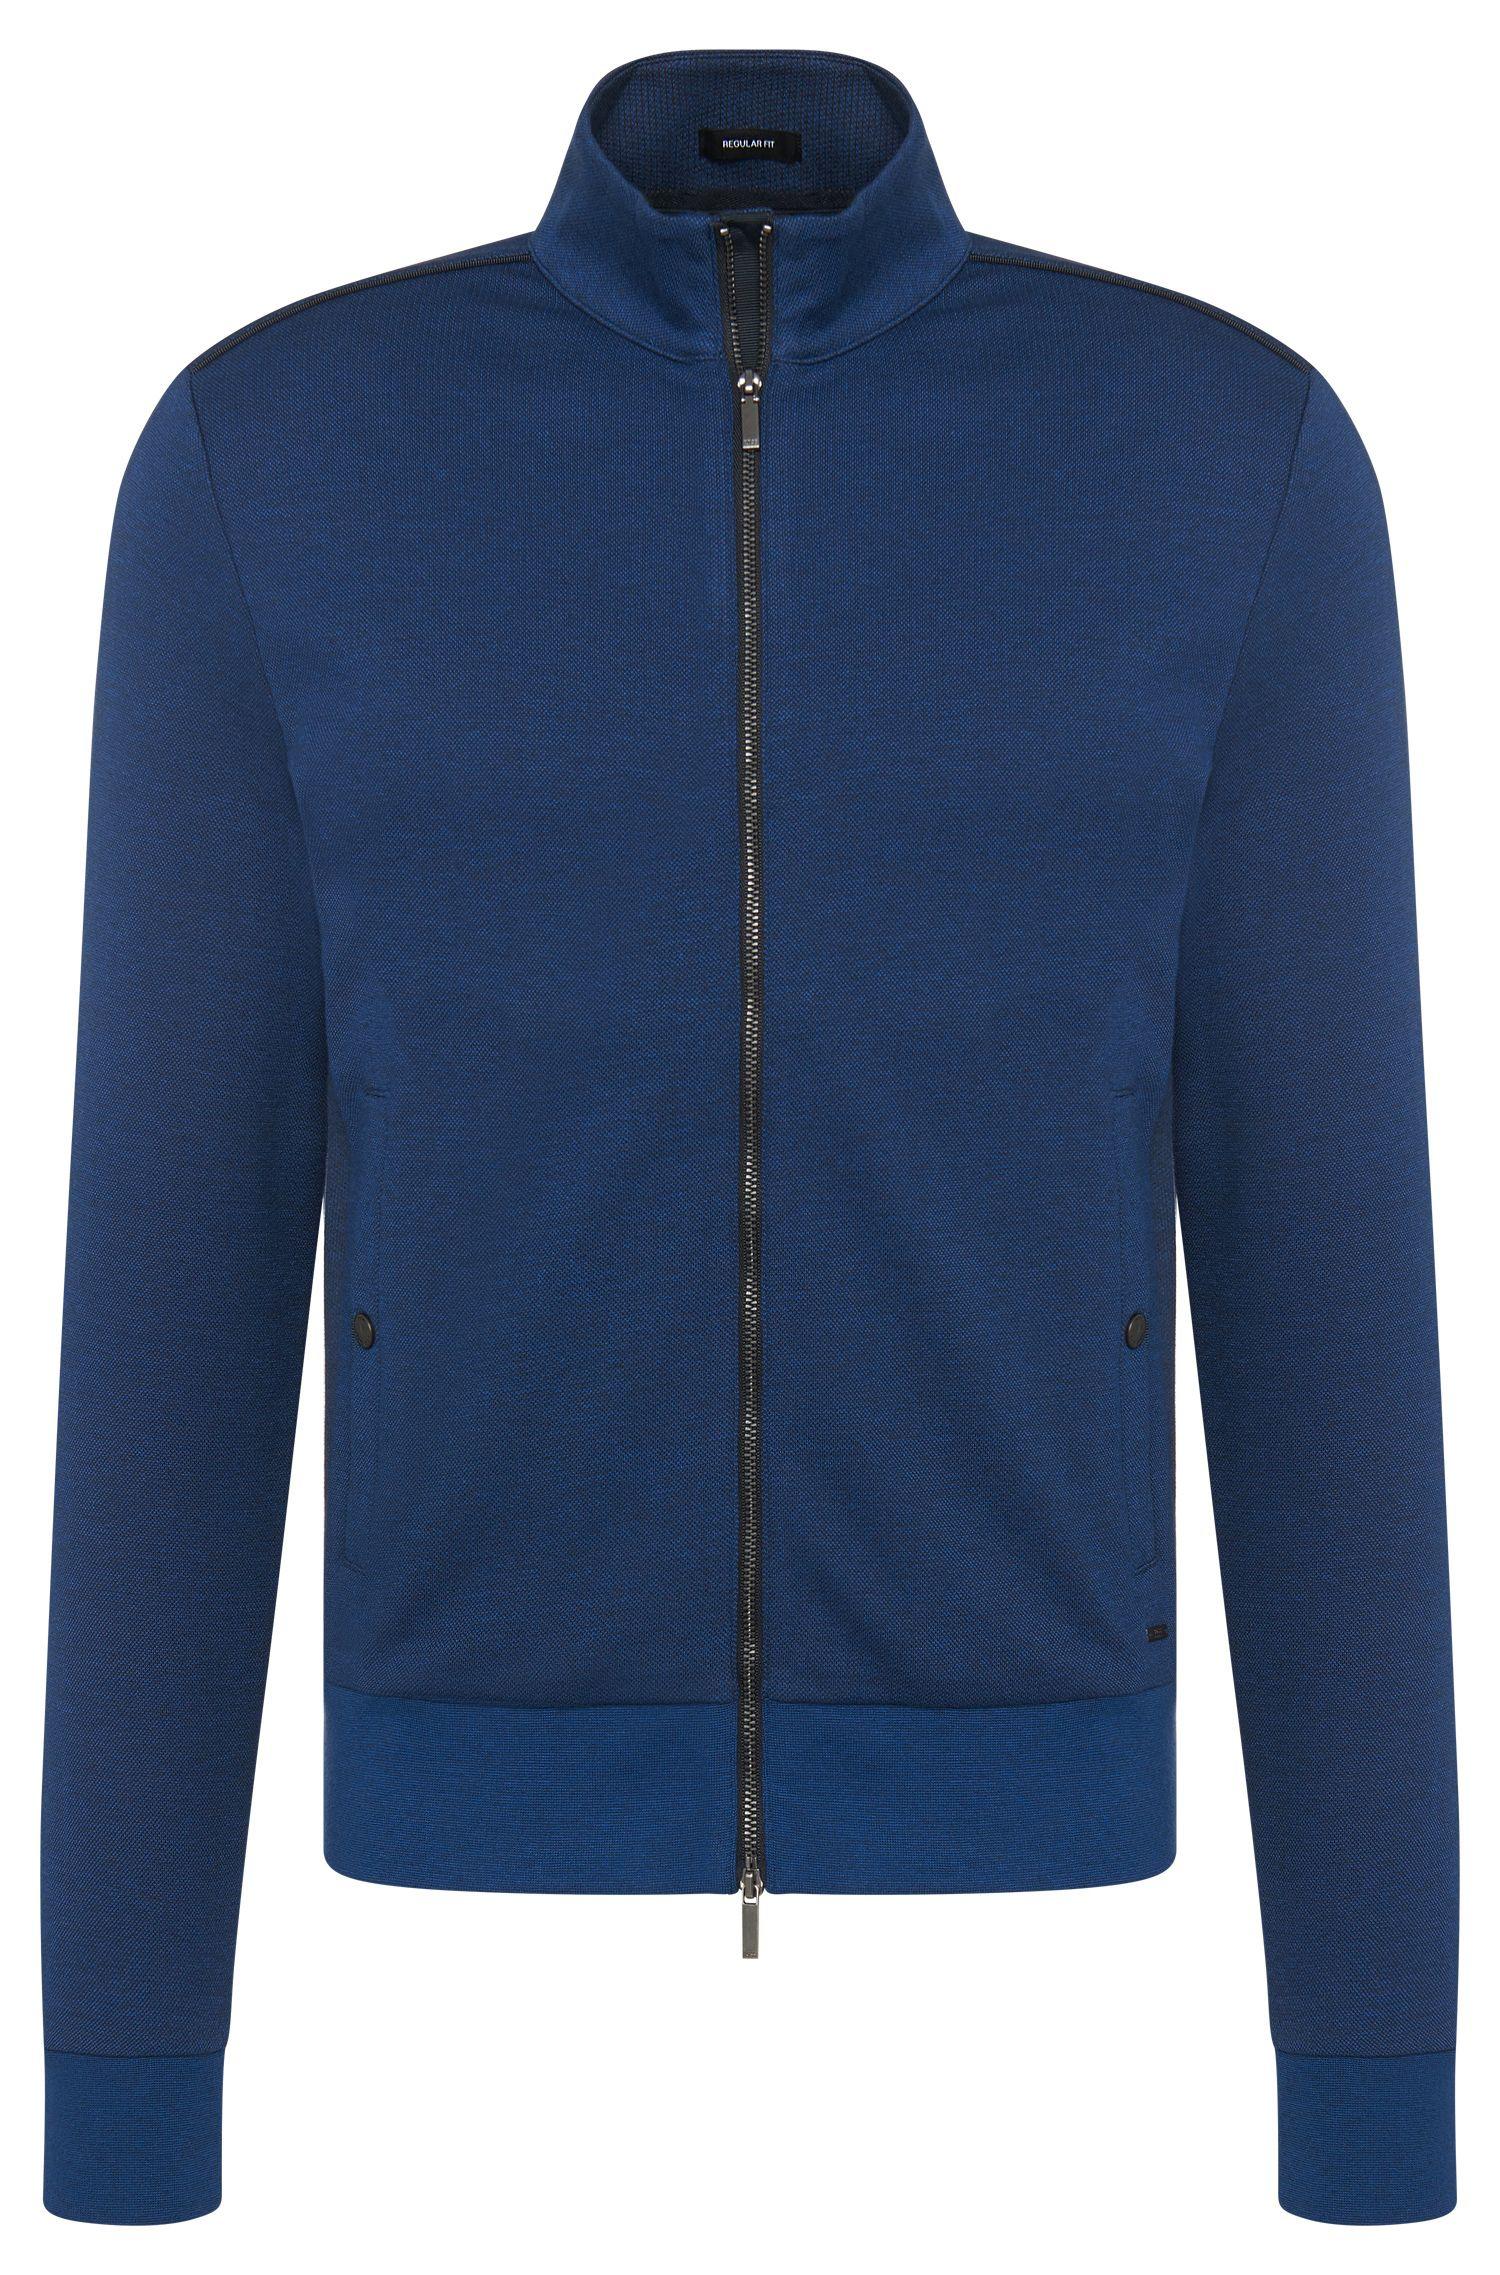 Mottled regular-fit sweatshirt jacket in cotton: 'Sommers 10'